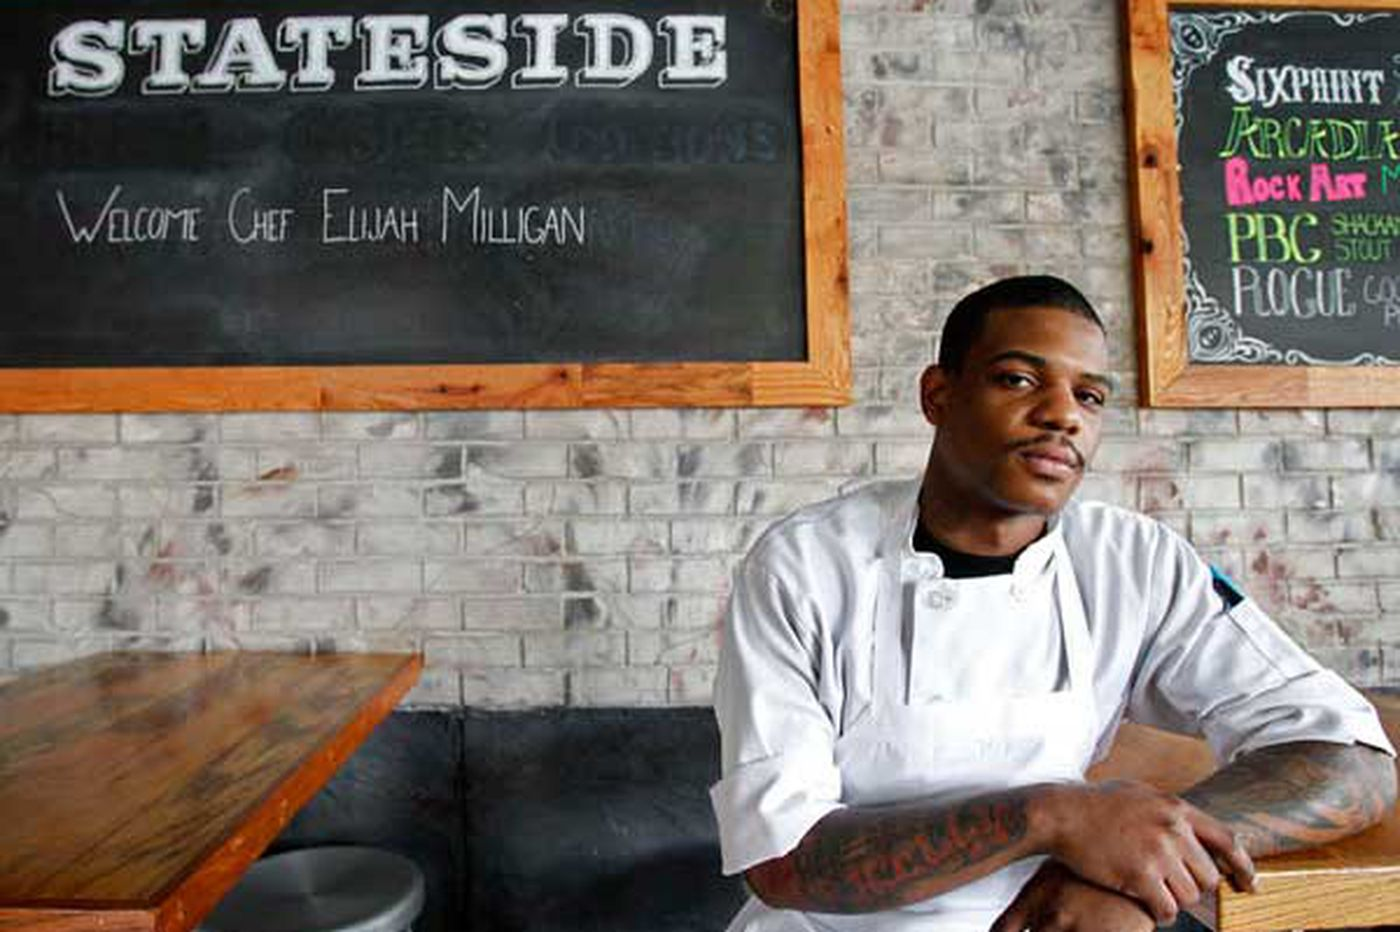 Celebrating Success: Stellar Stateside meets its match with new chef Elijah Milligan